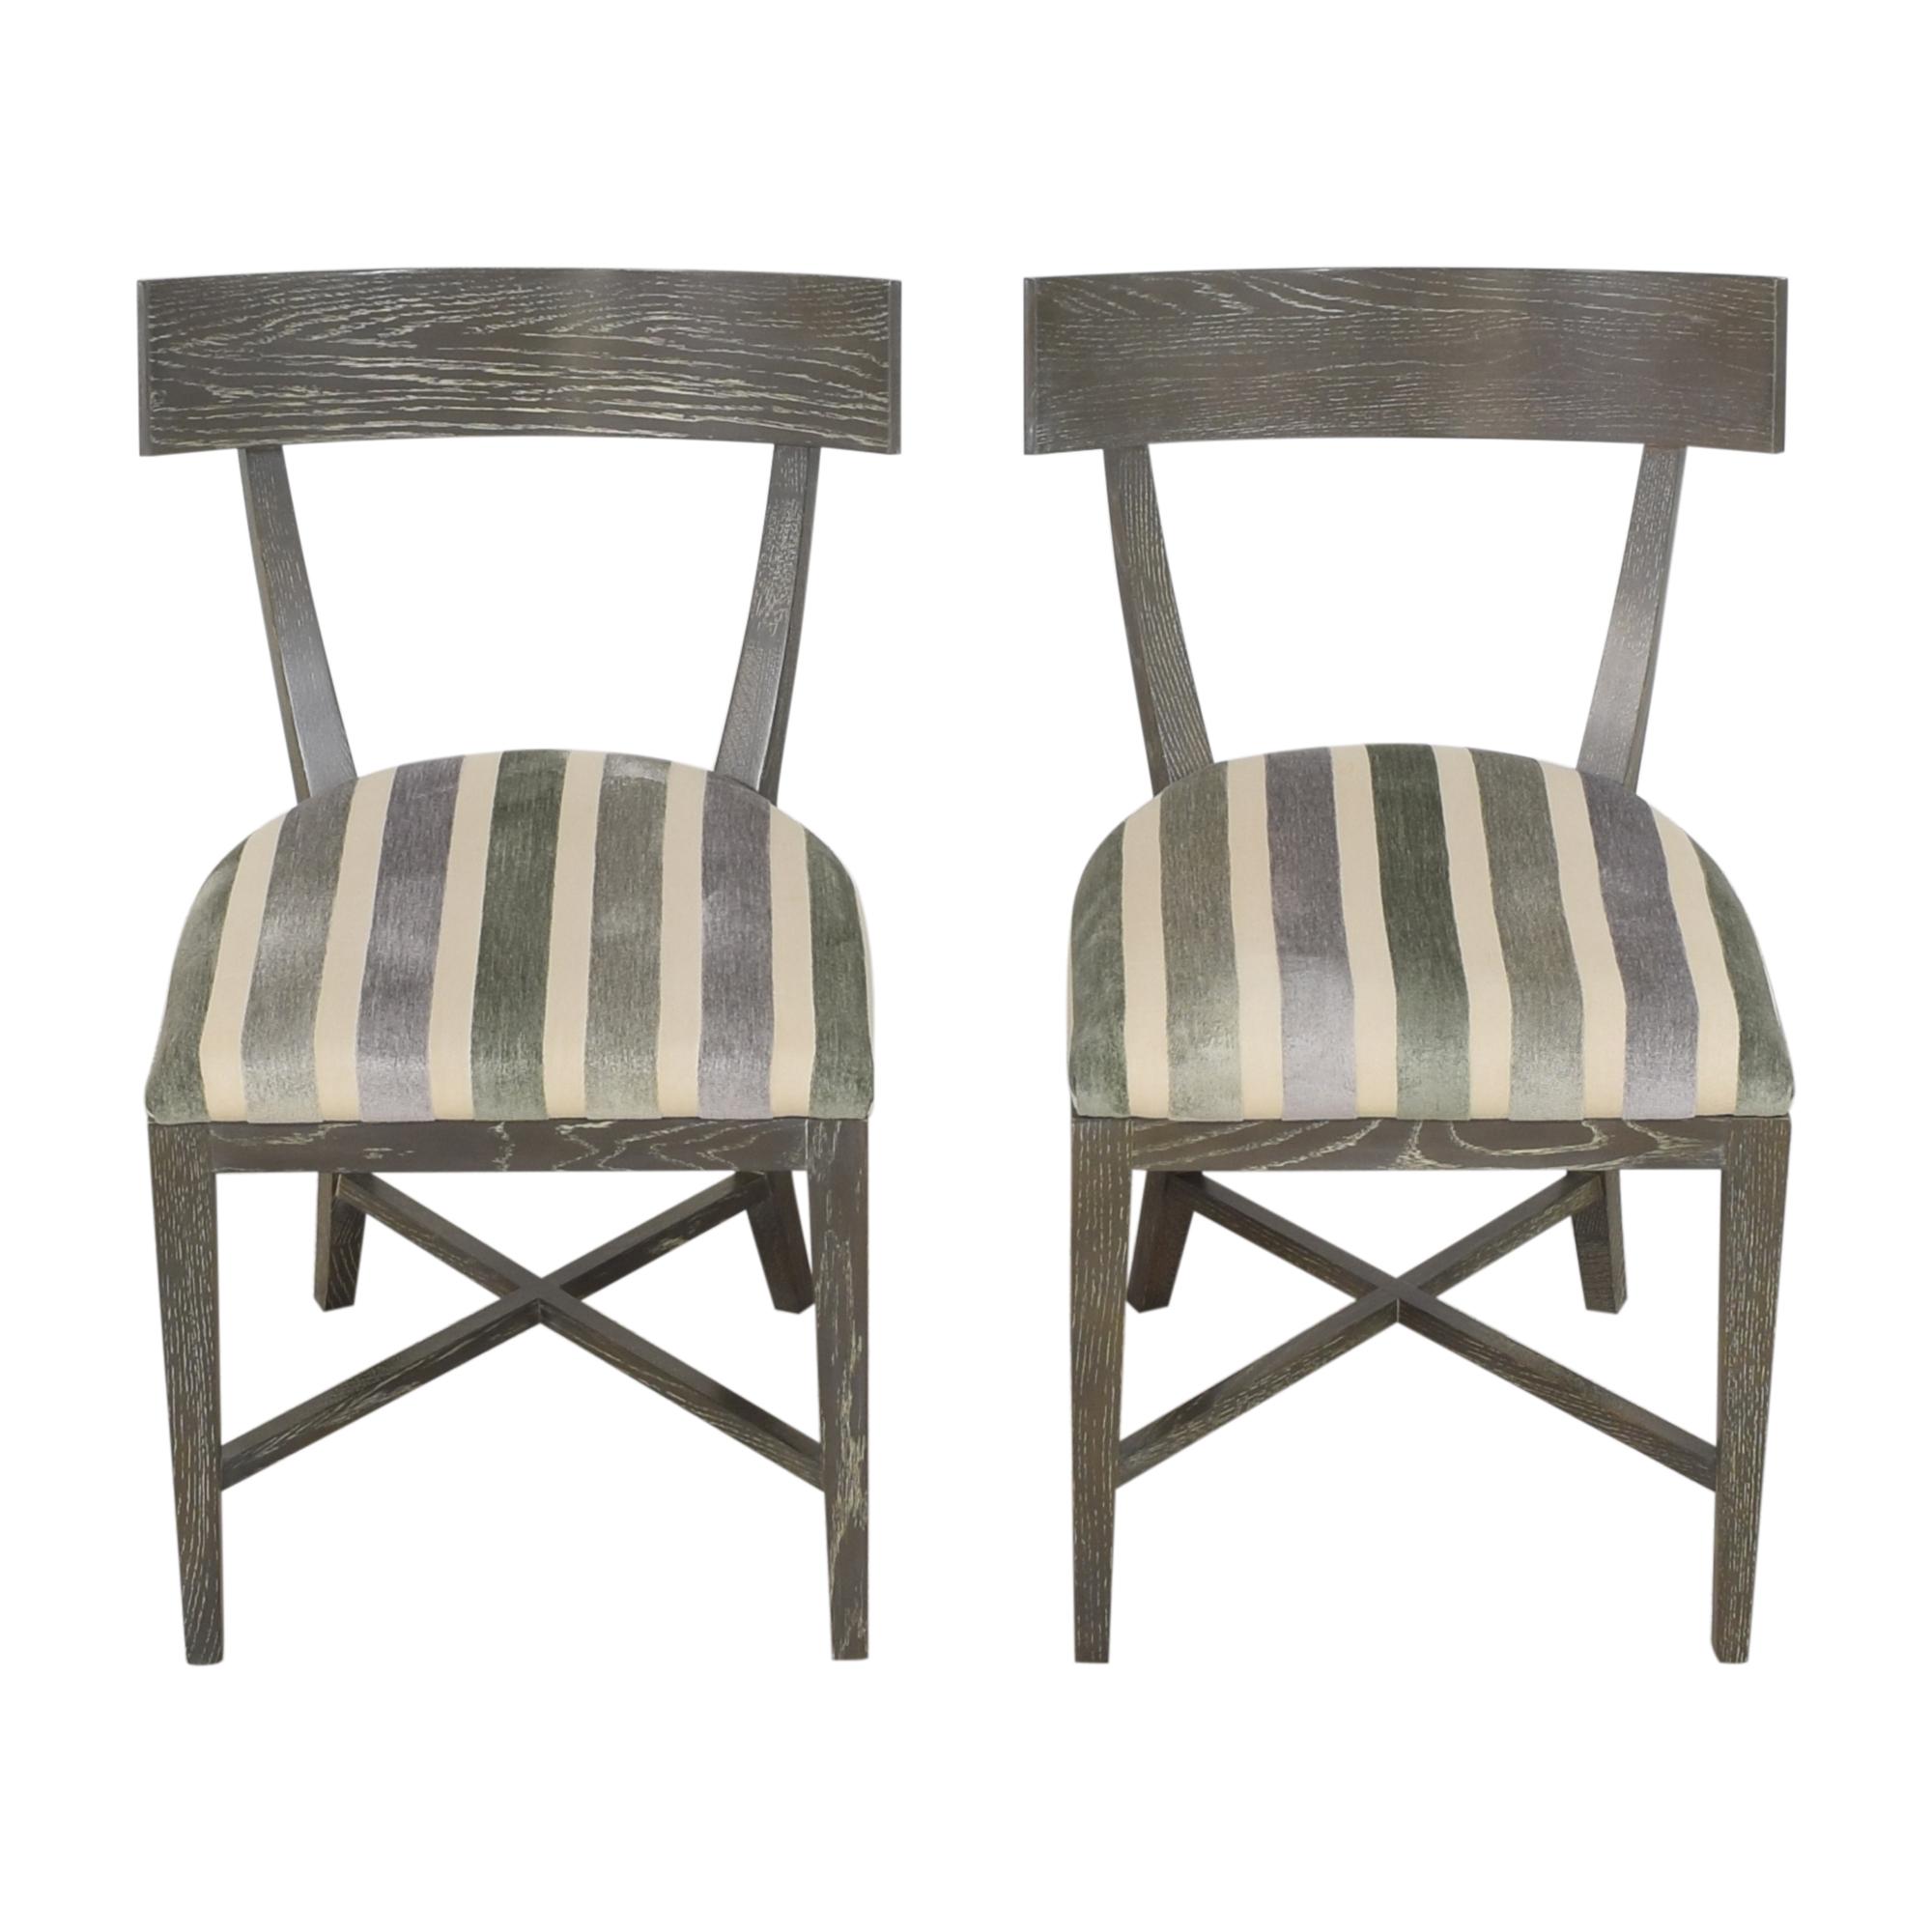 Arteriors Arteriors Caden Dining Chairs second hand